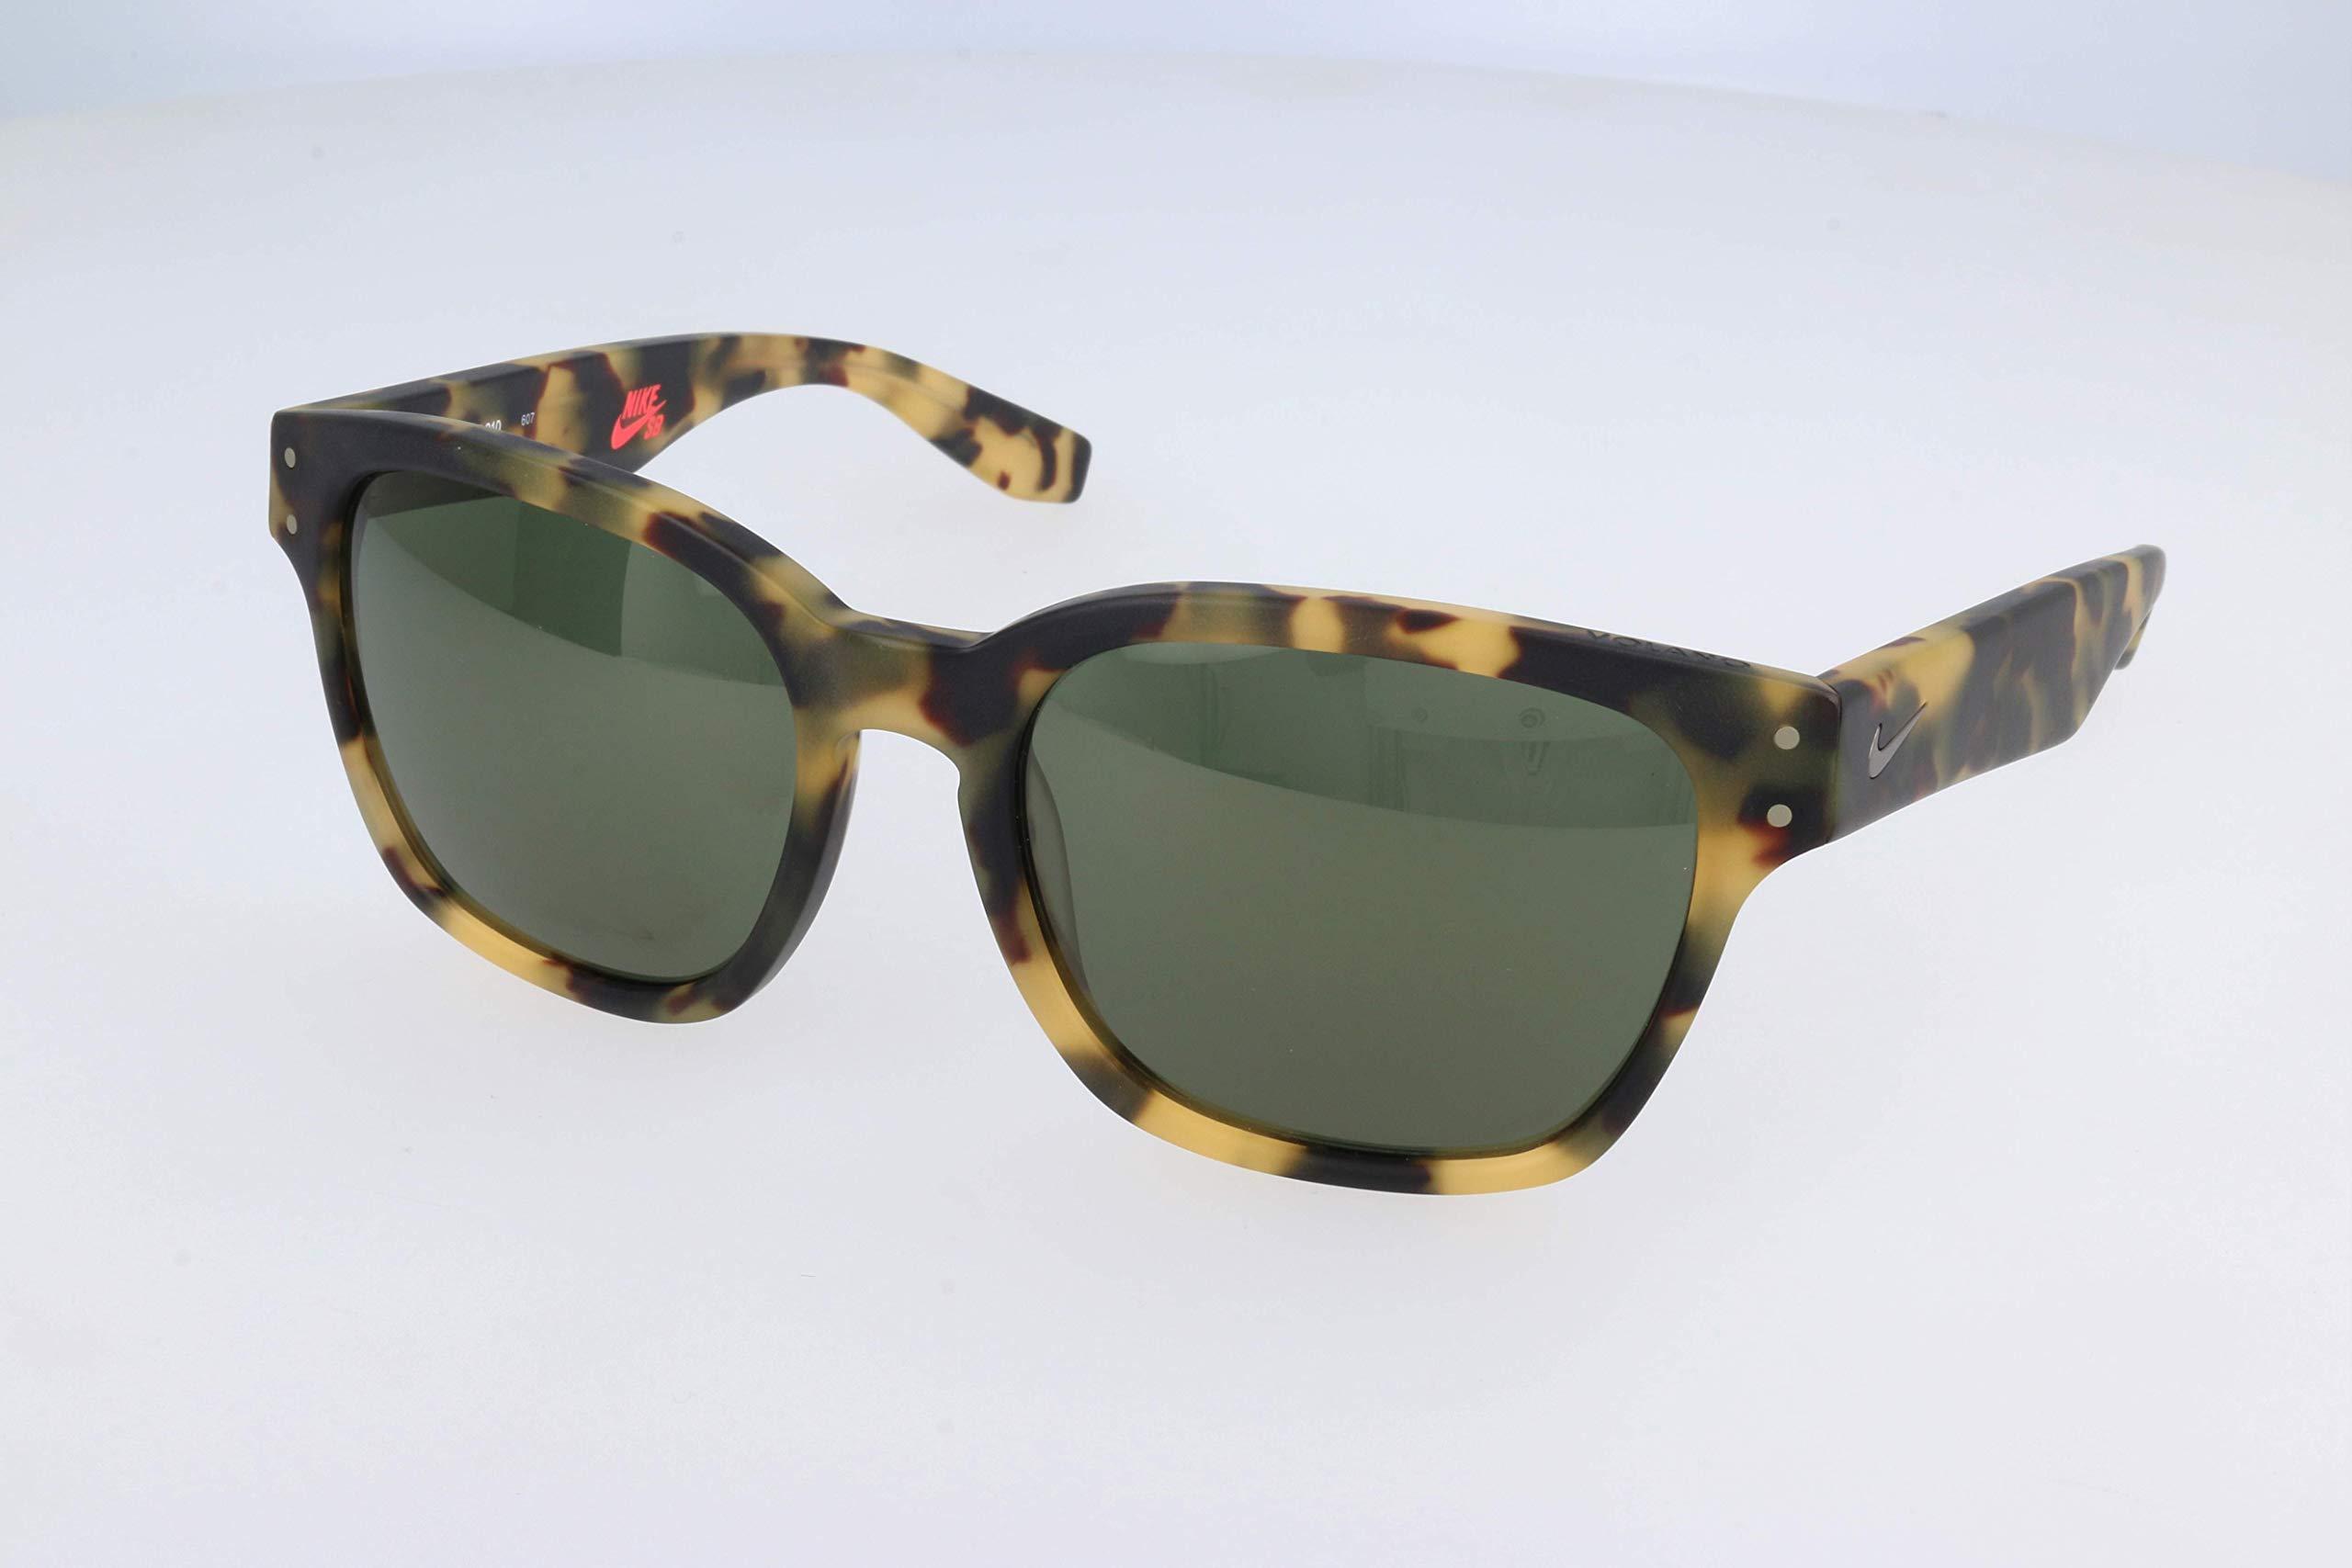 Nike EV0877-210 Volano Sunglasses (Frame Green with Gunmetal Flash Lens), Tokyo Tortoise